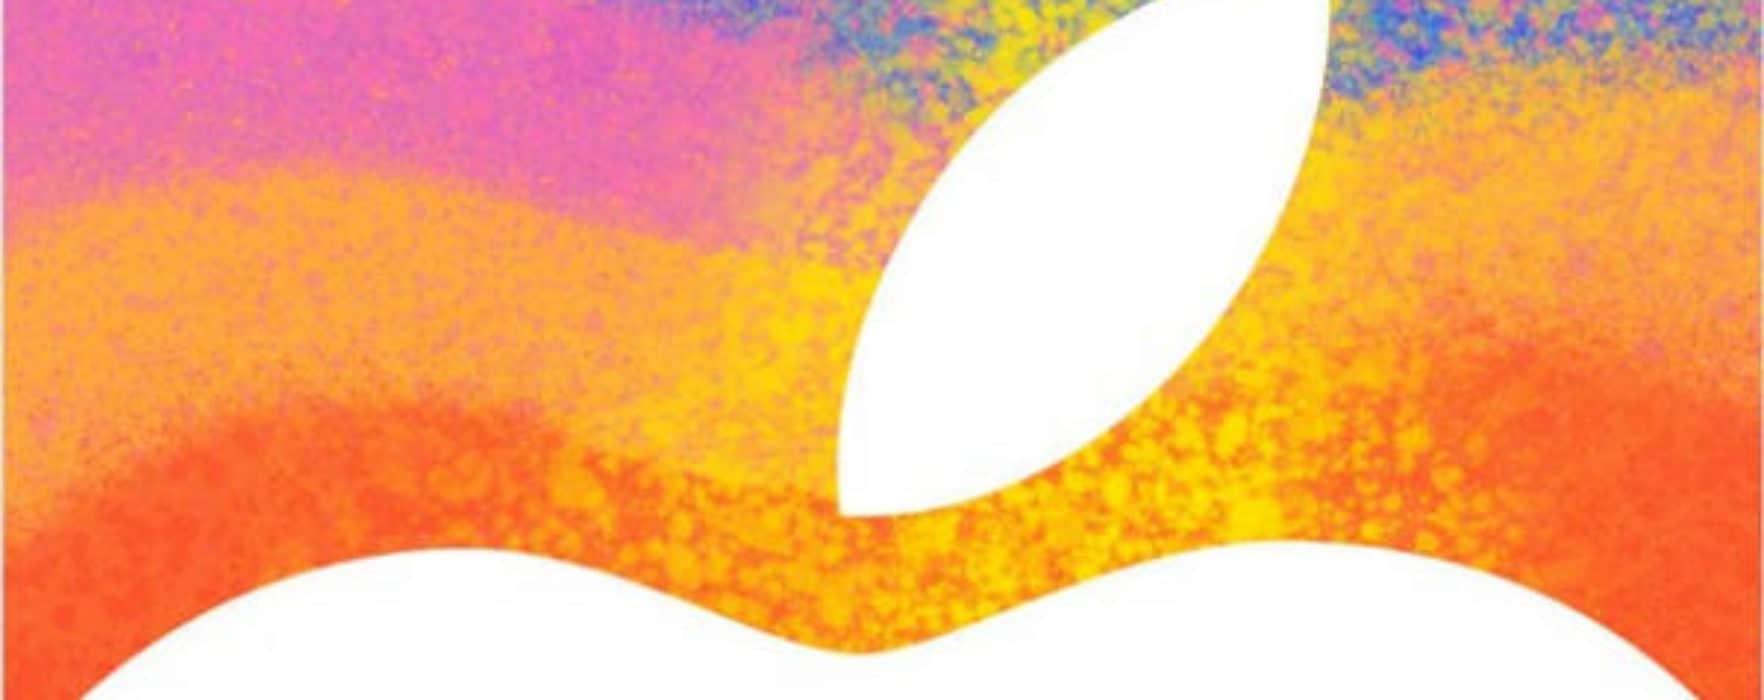 Apple's New iPad Mini and iPad 4 Unveiled